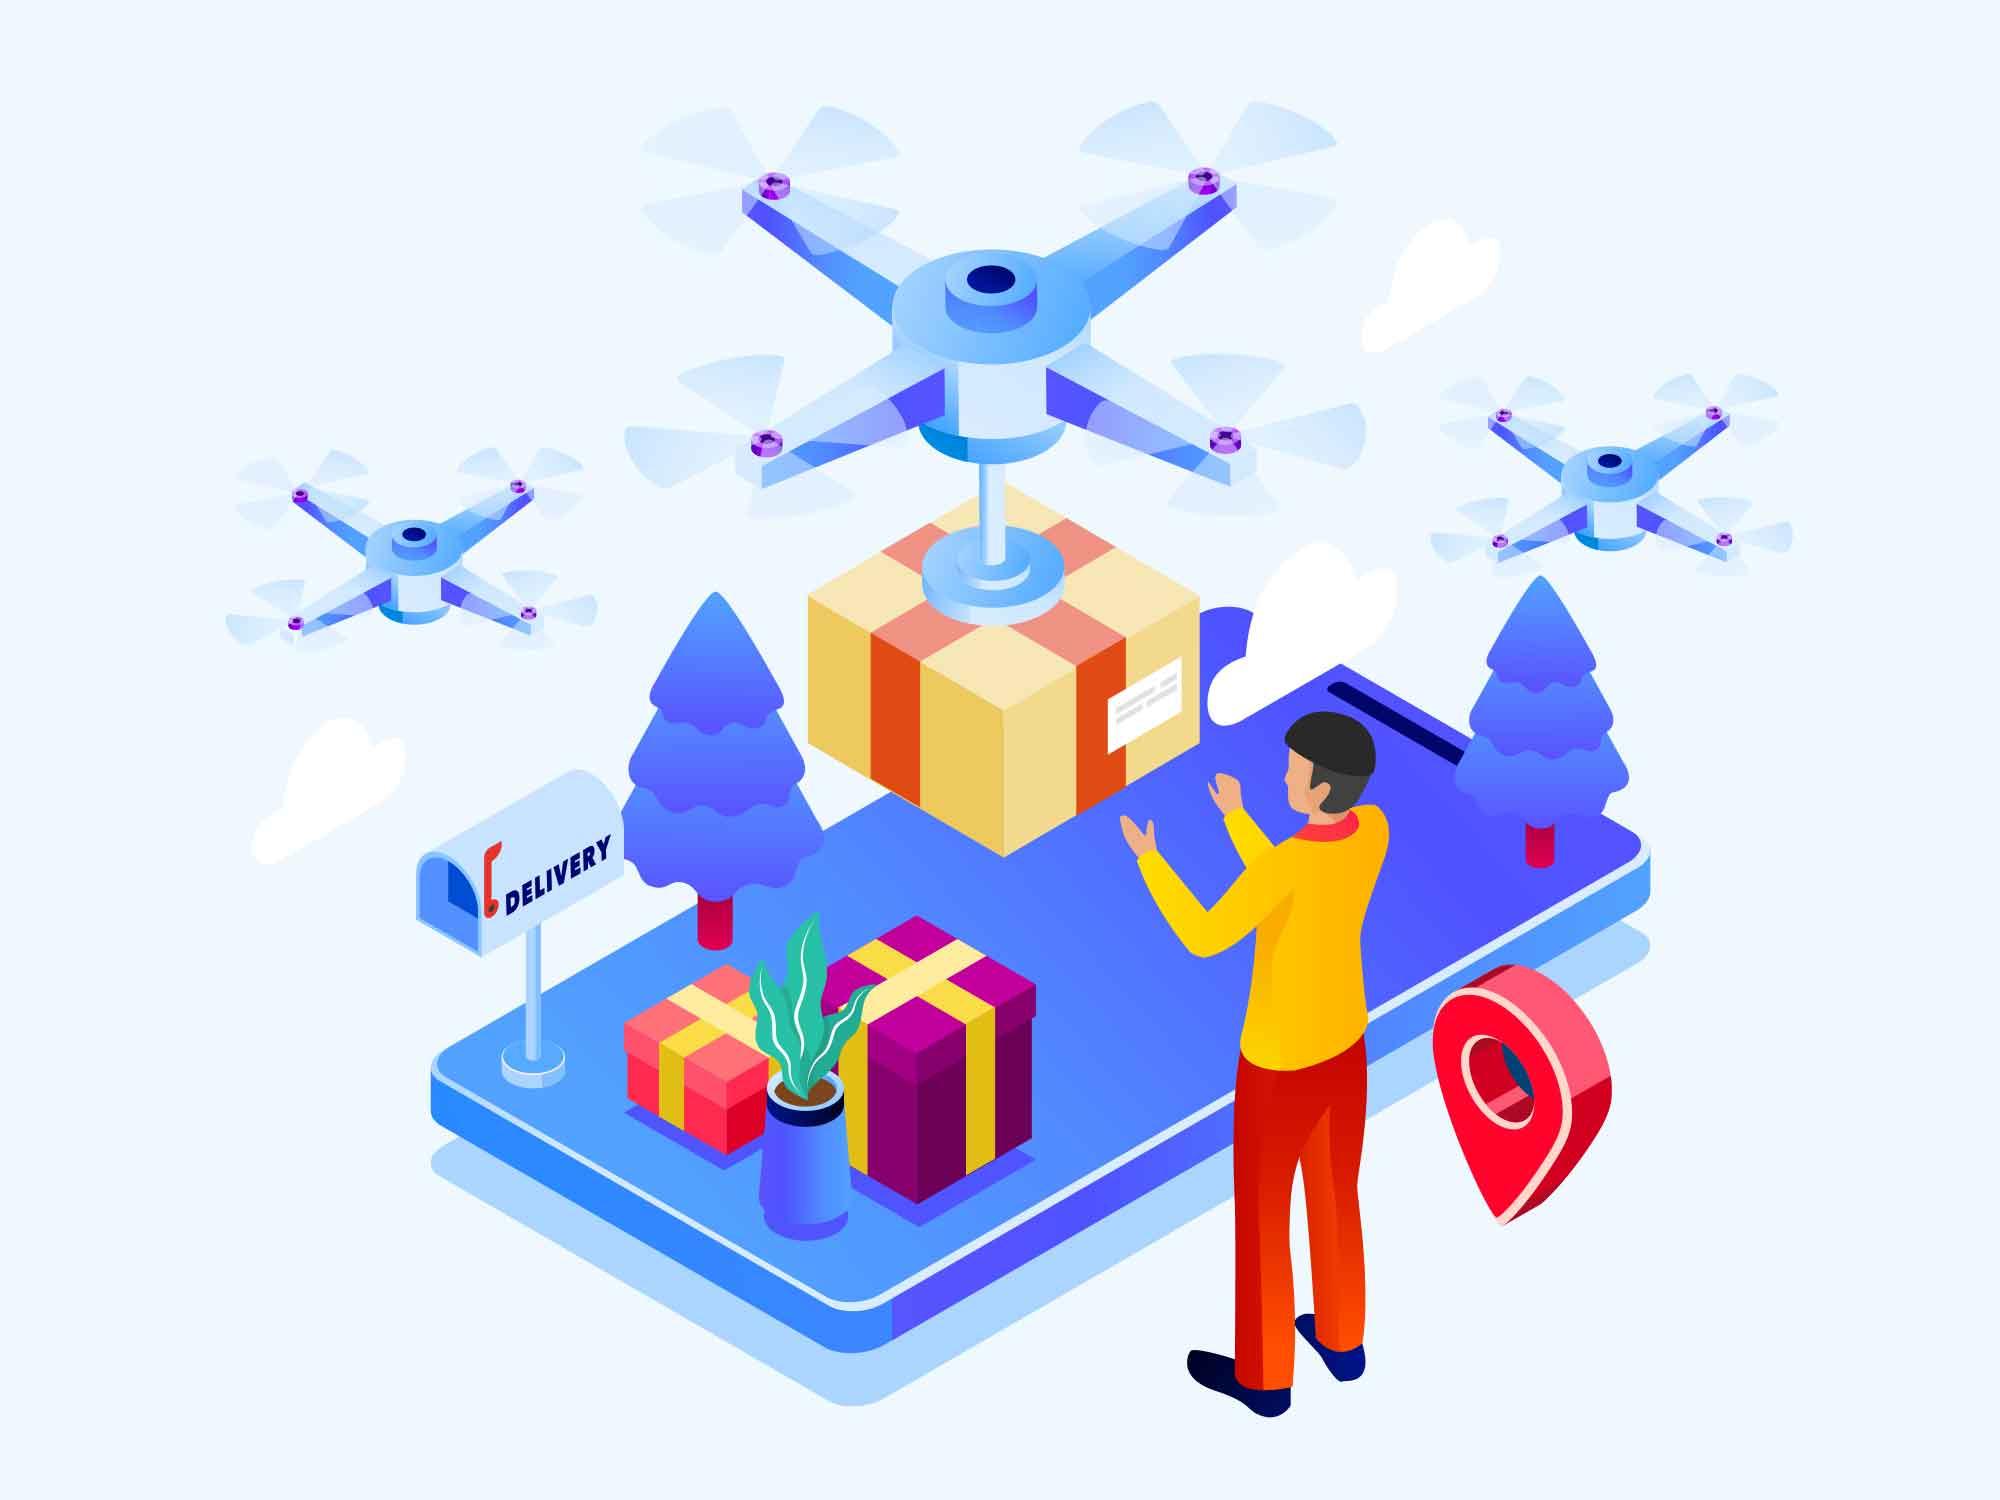 Drone Shipping Illustration Light Version